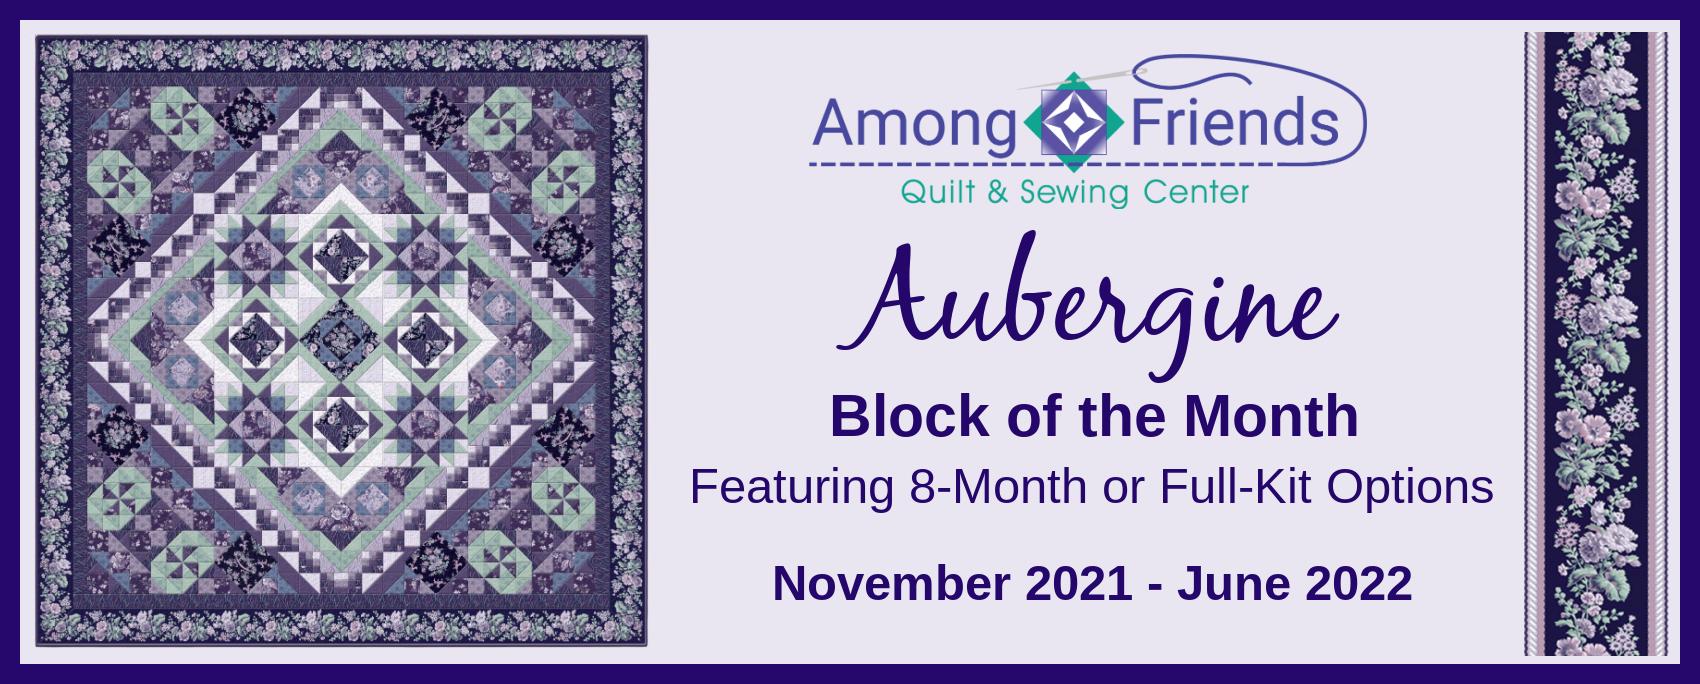 Aubergine Block of the Month Registration Fee